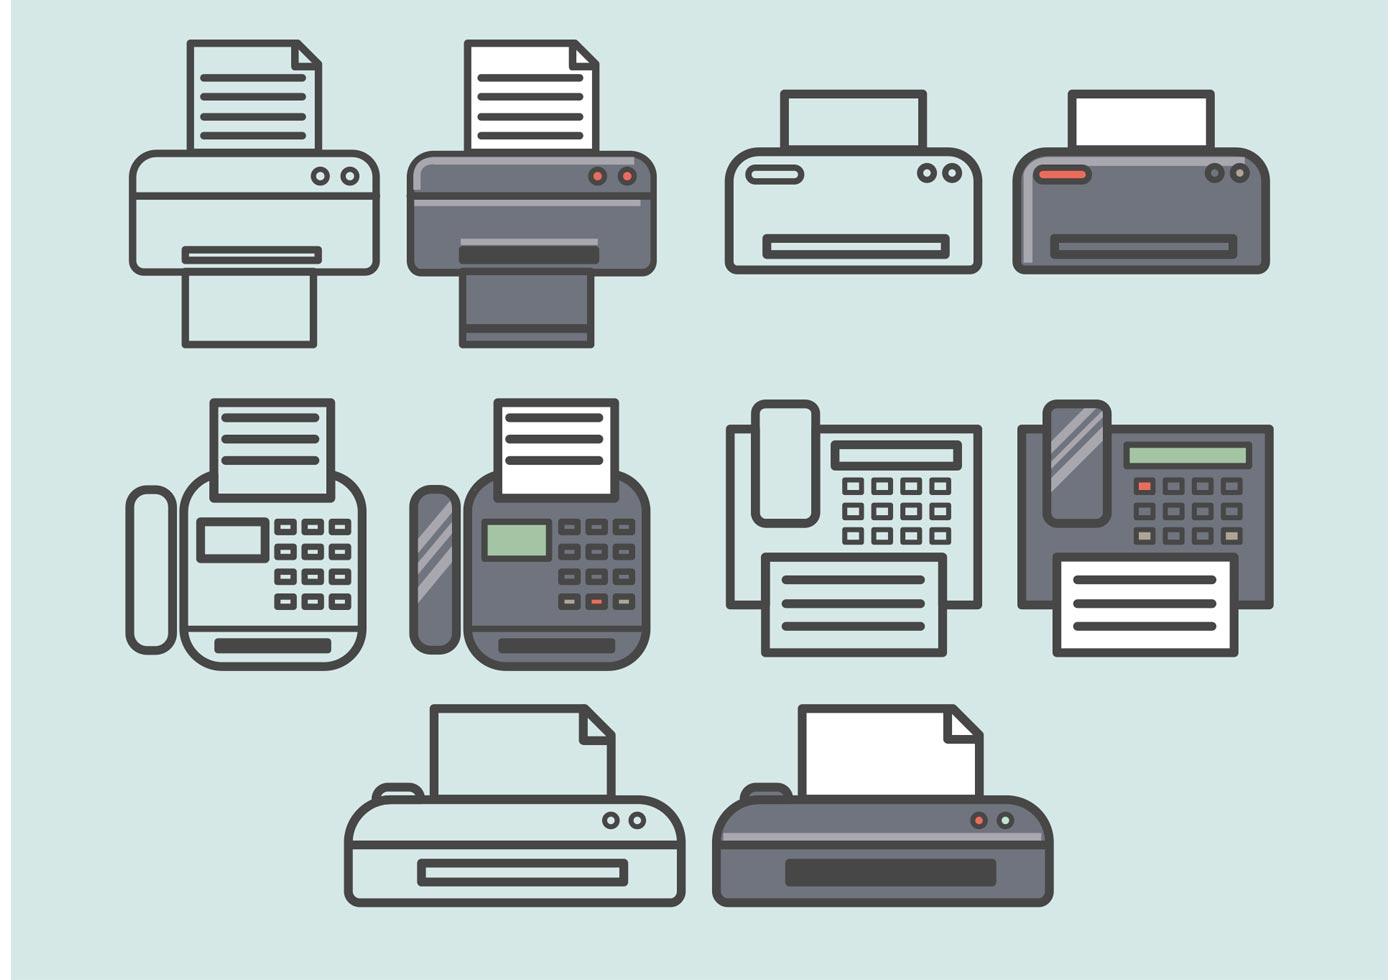 vector fax icons set download free vectors clipart graphics vector art https www vecteezy com vector art 92951 vector fax icons set